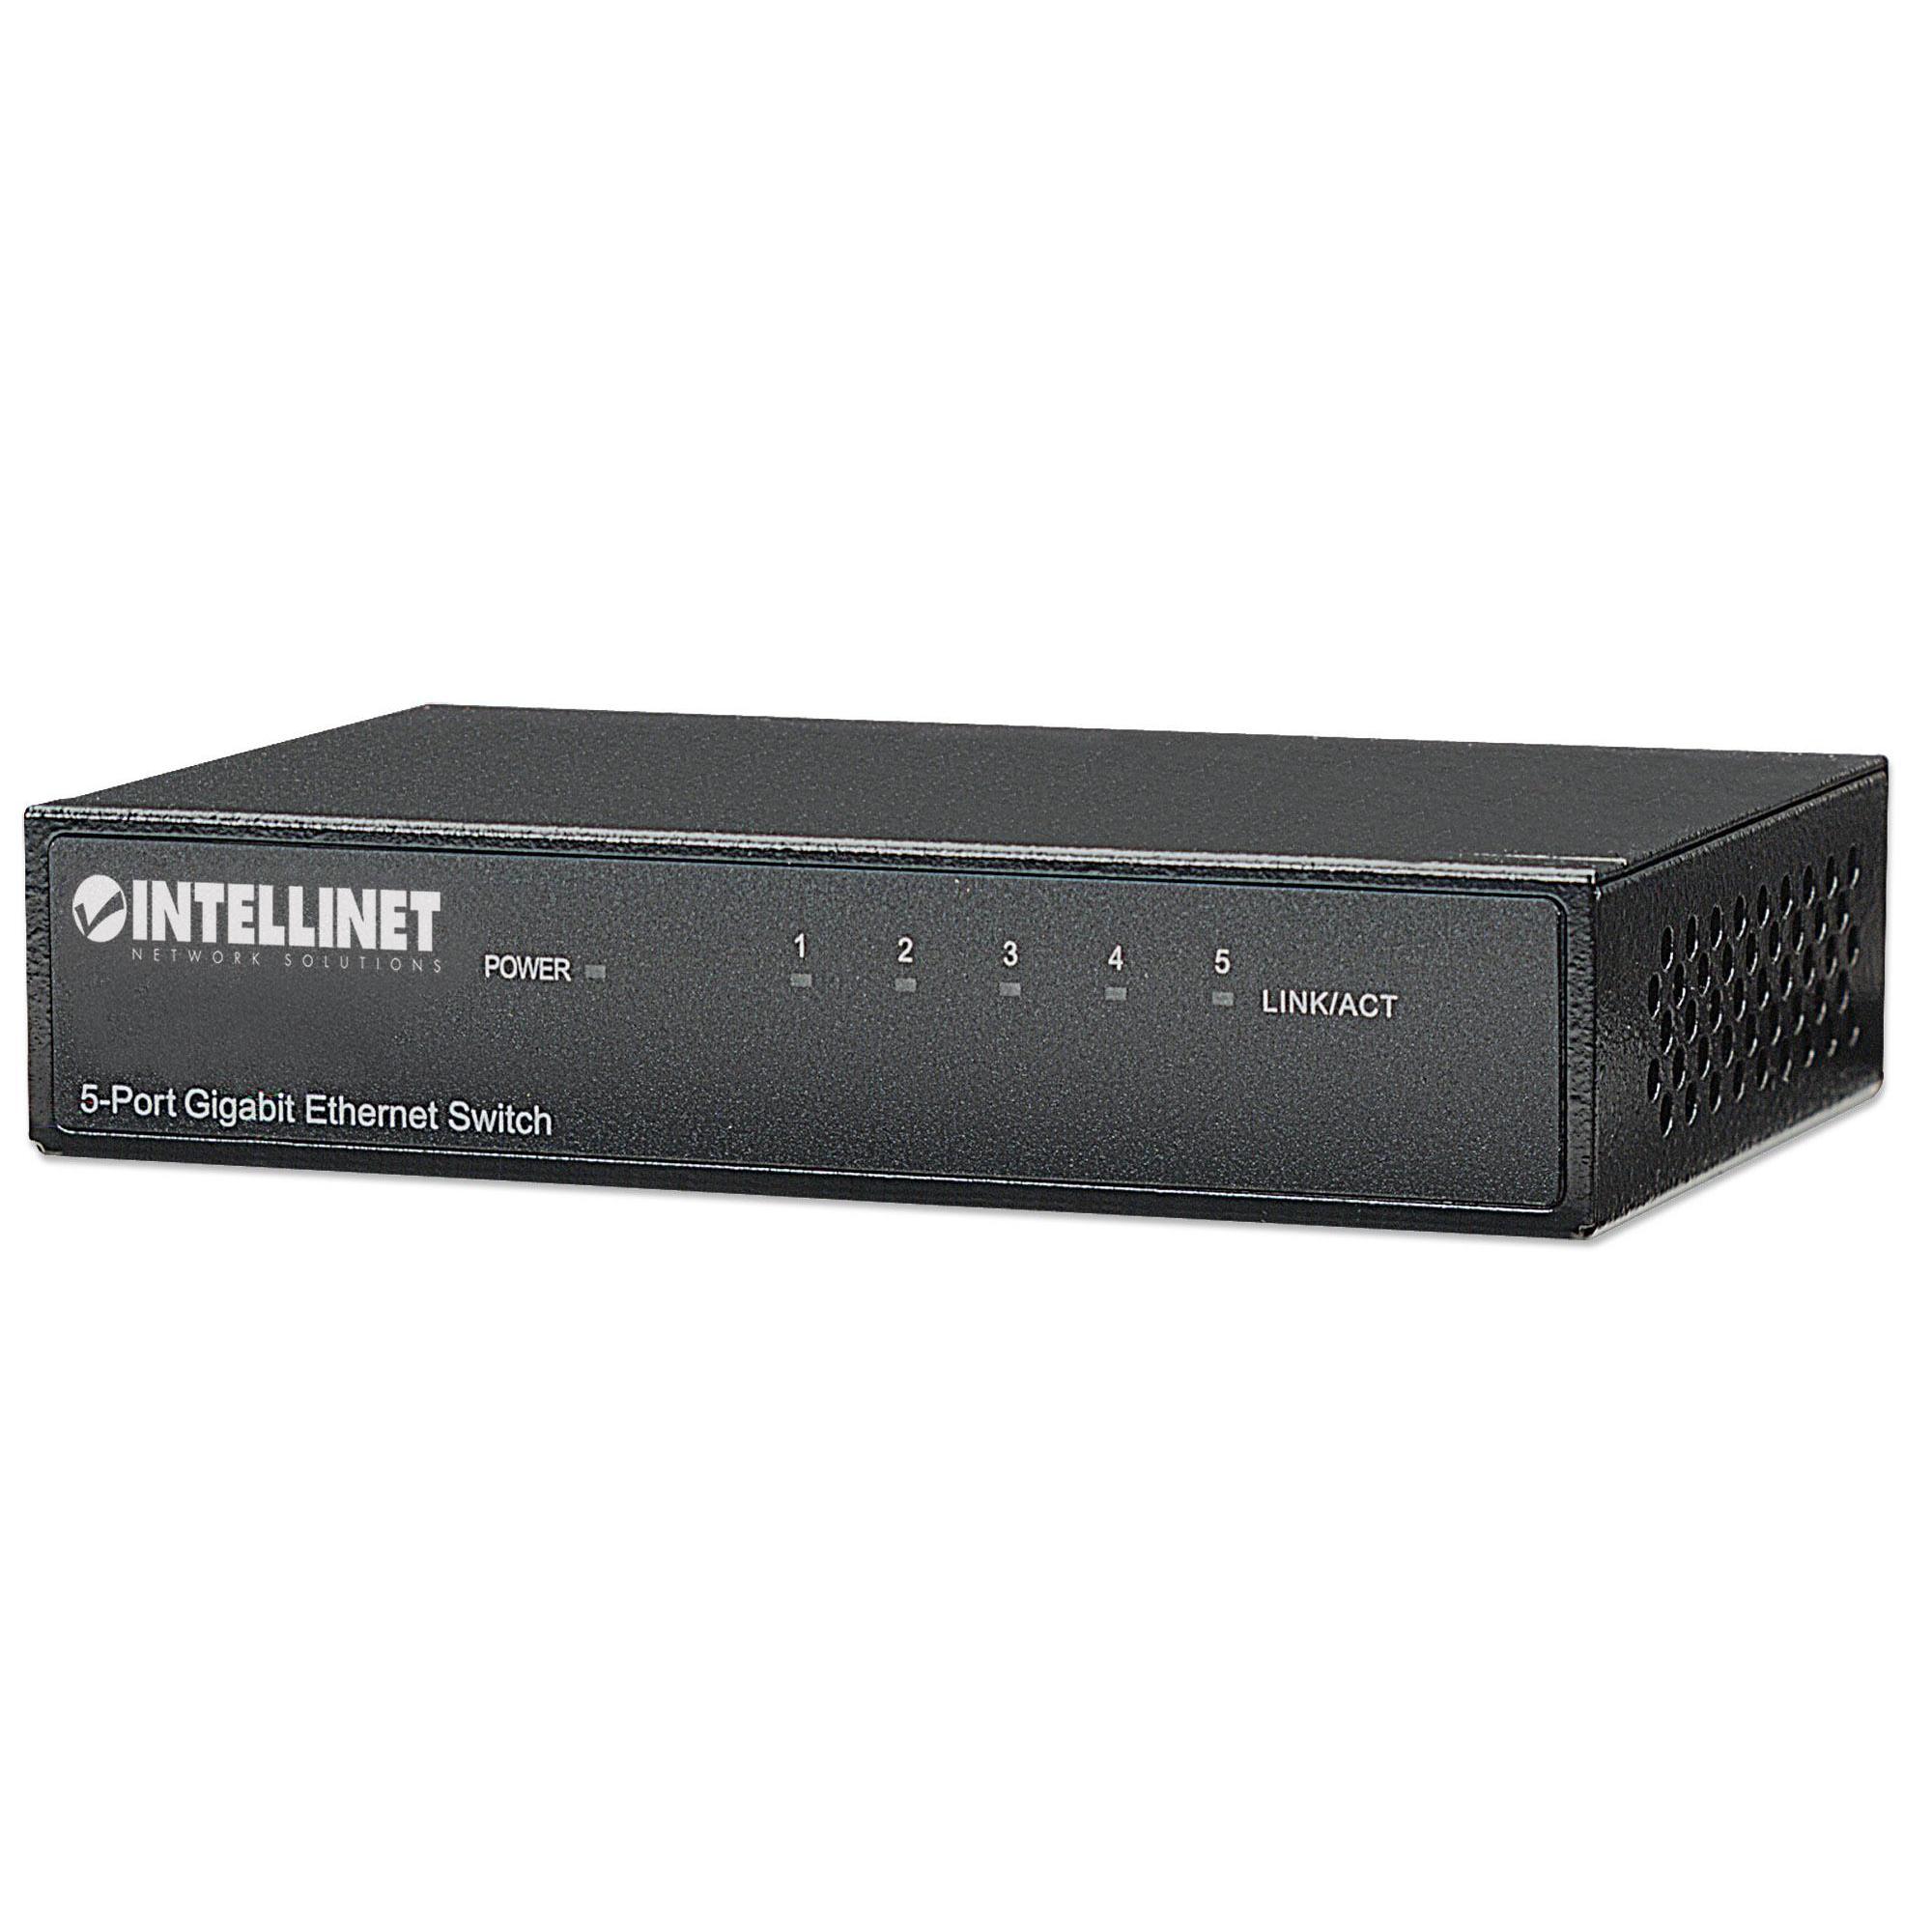 Ethernet Switch Gigabit 5 porte